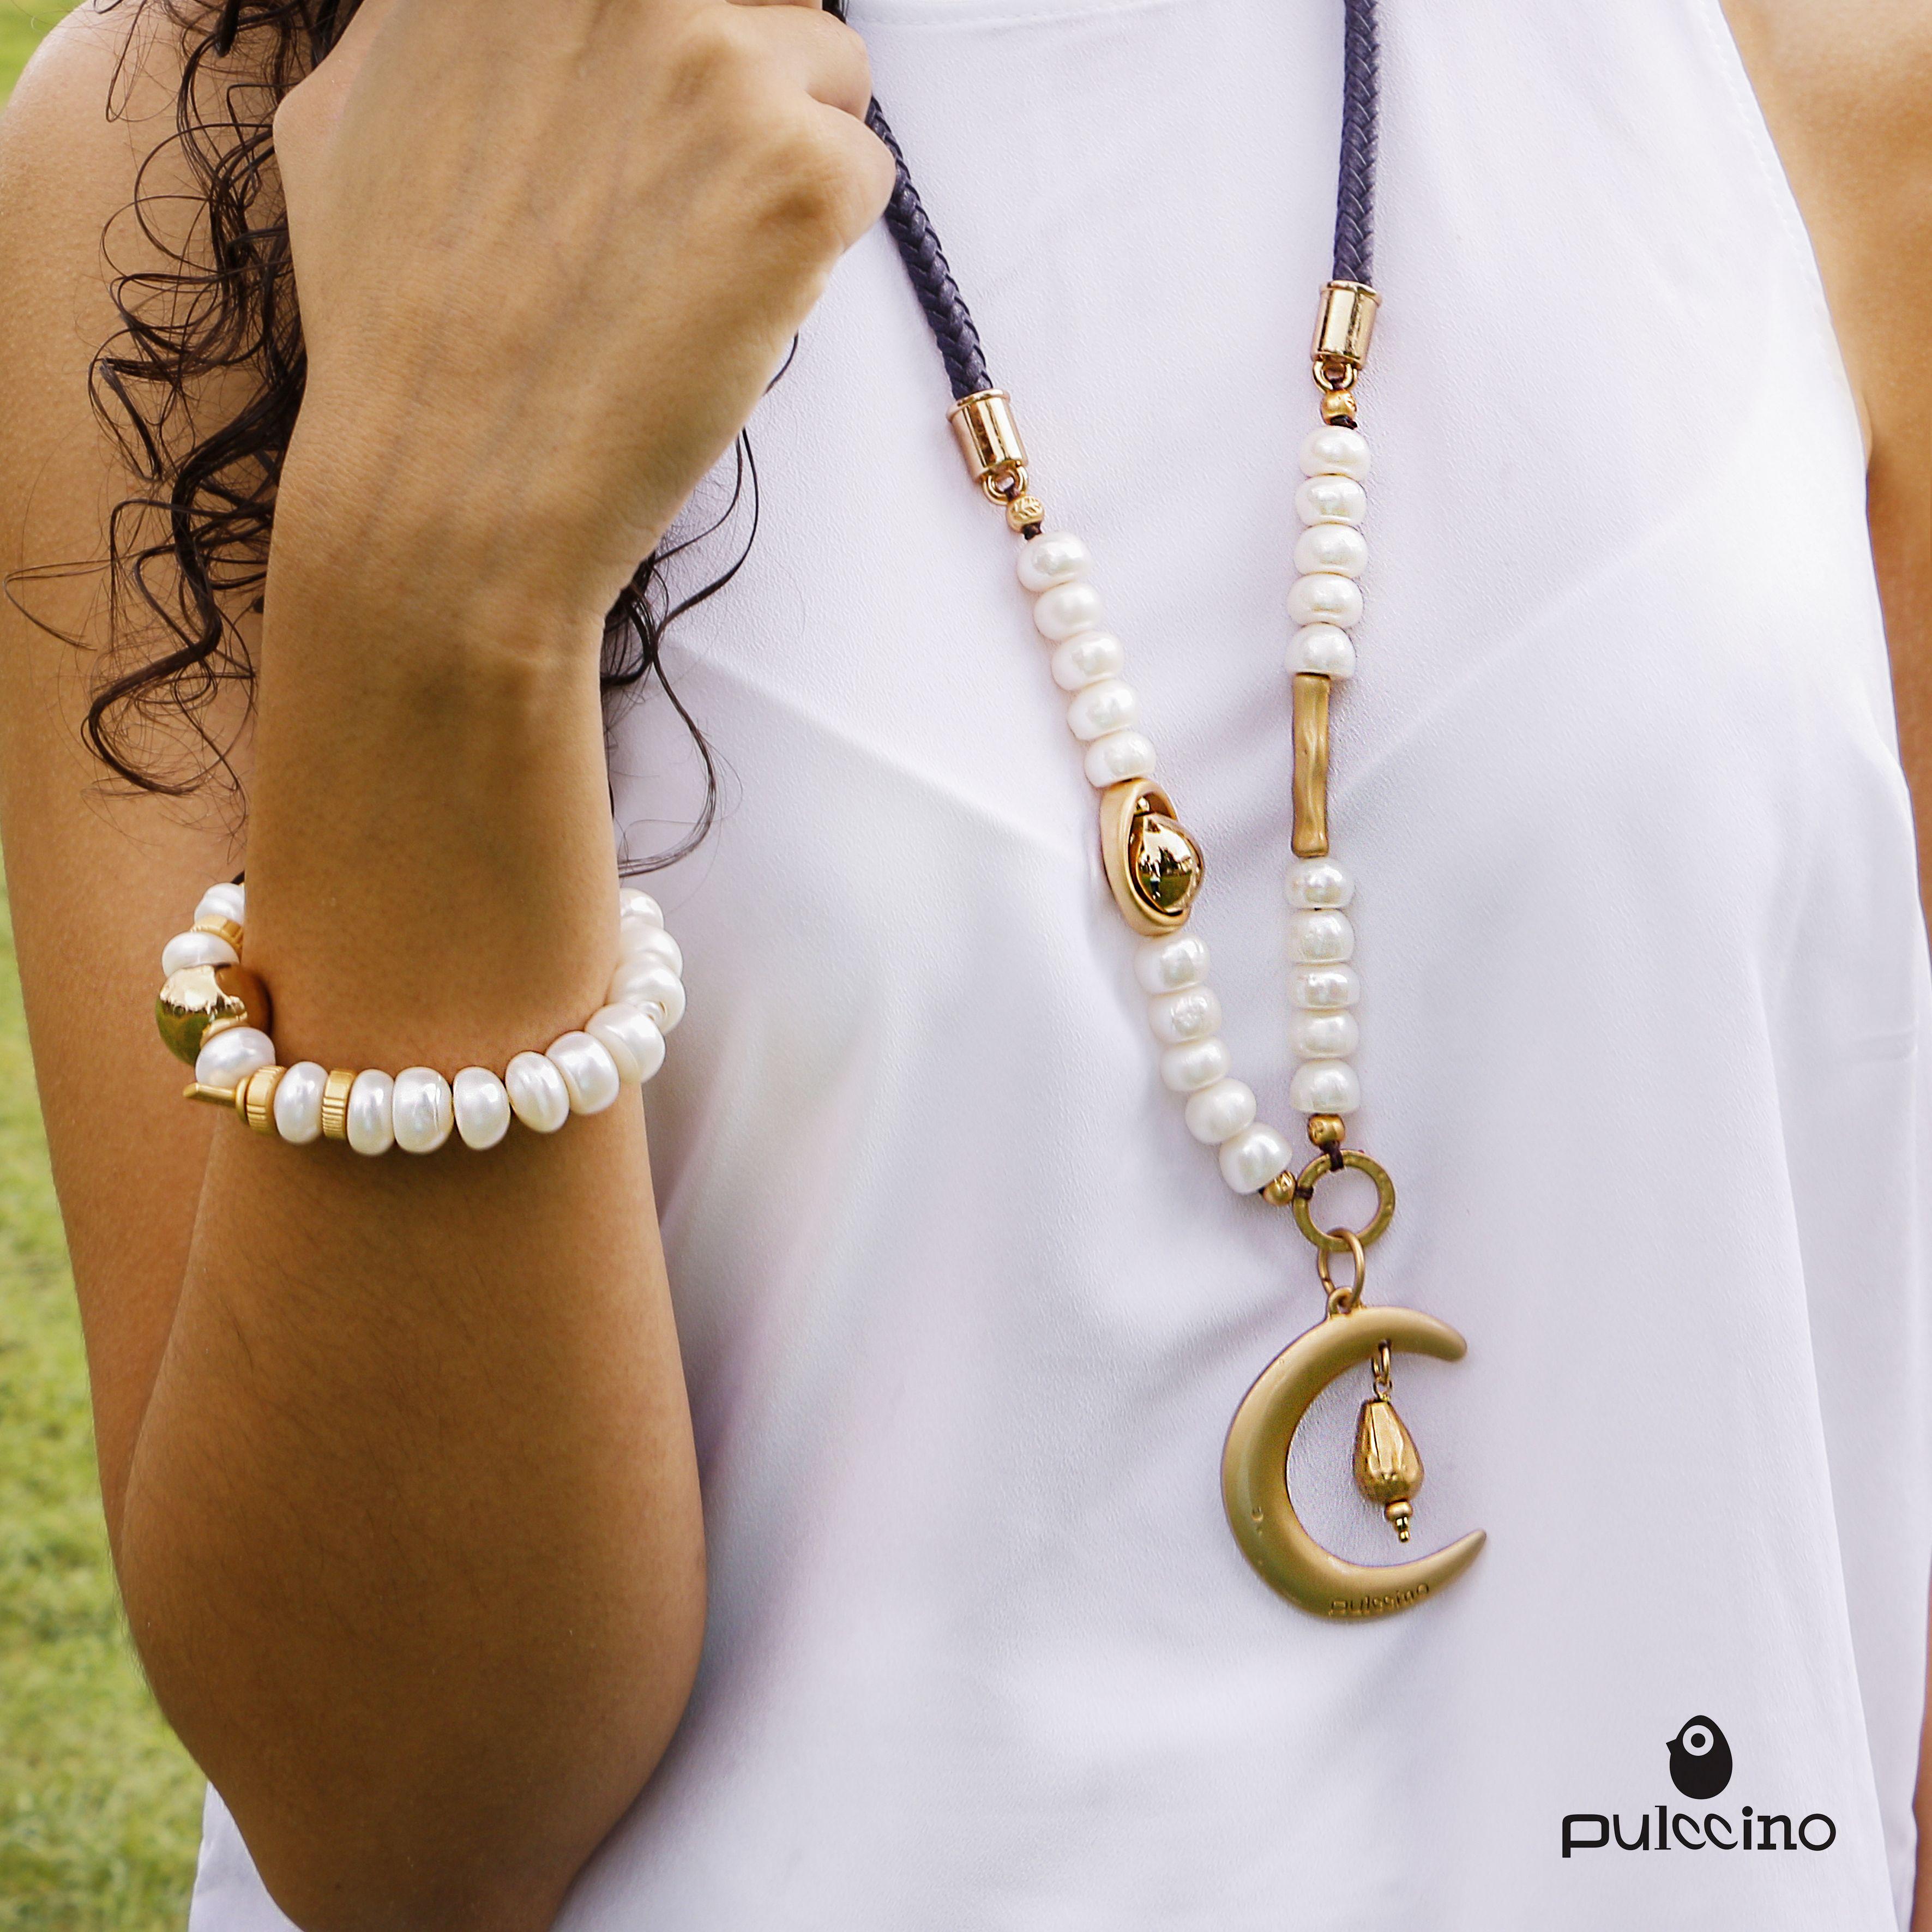 66225852bd10  pulccino  accesorios  joyeria  jewelry  accesories Collares Modernos